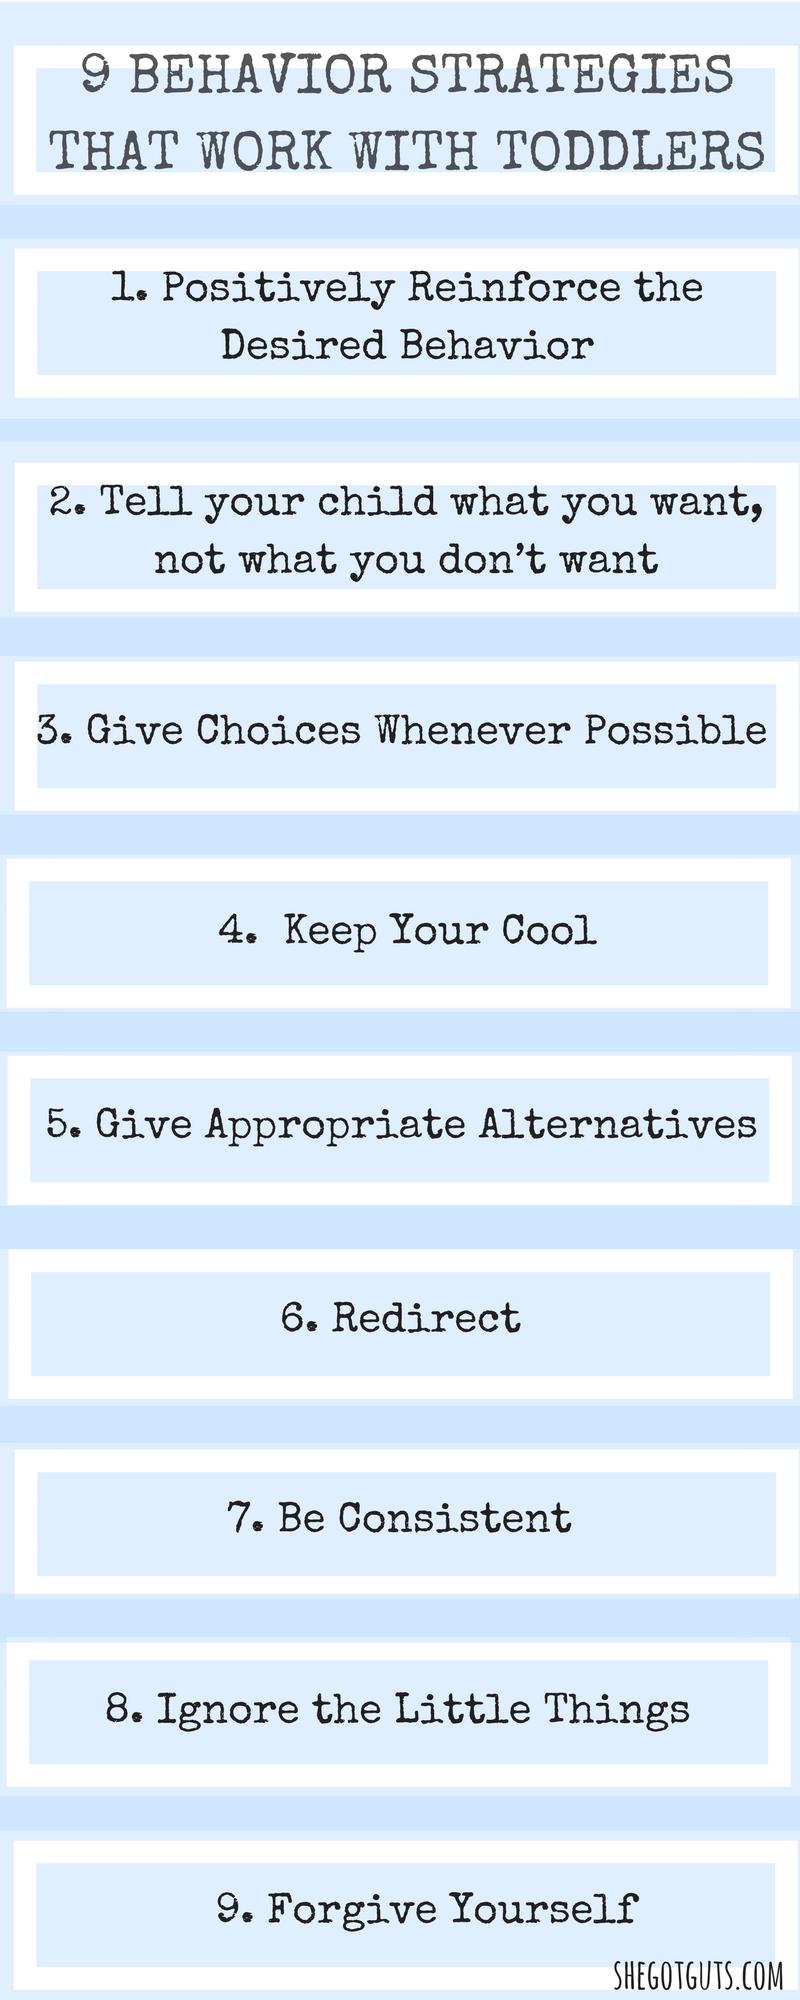 Behavior Strategies that Work.png